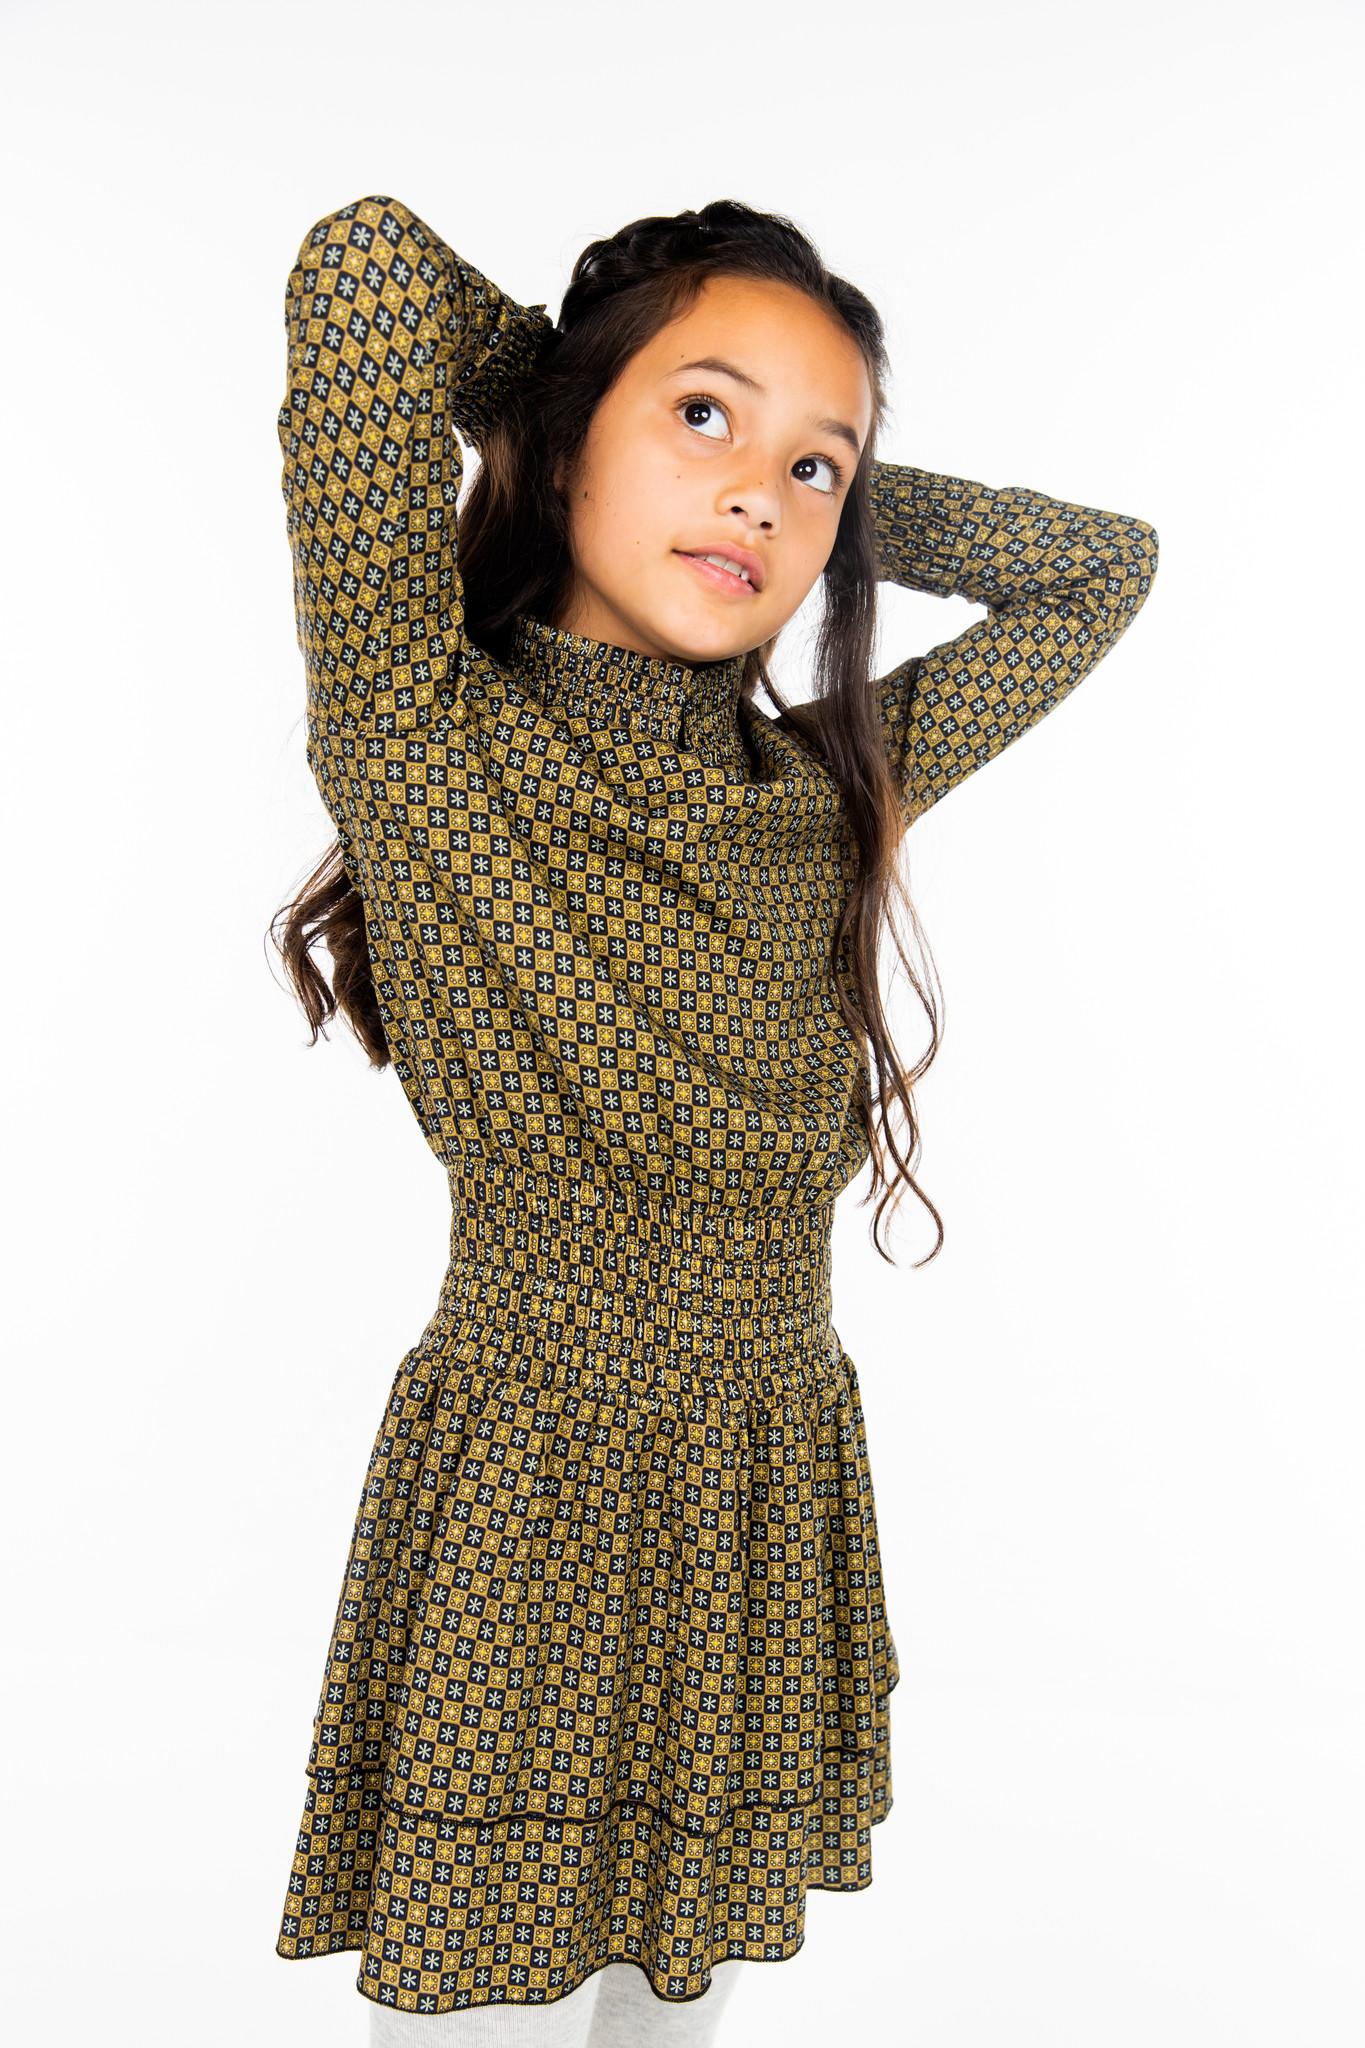 Mayce Girlslabel lookbook winter 2022-57